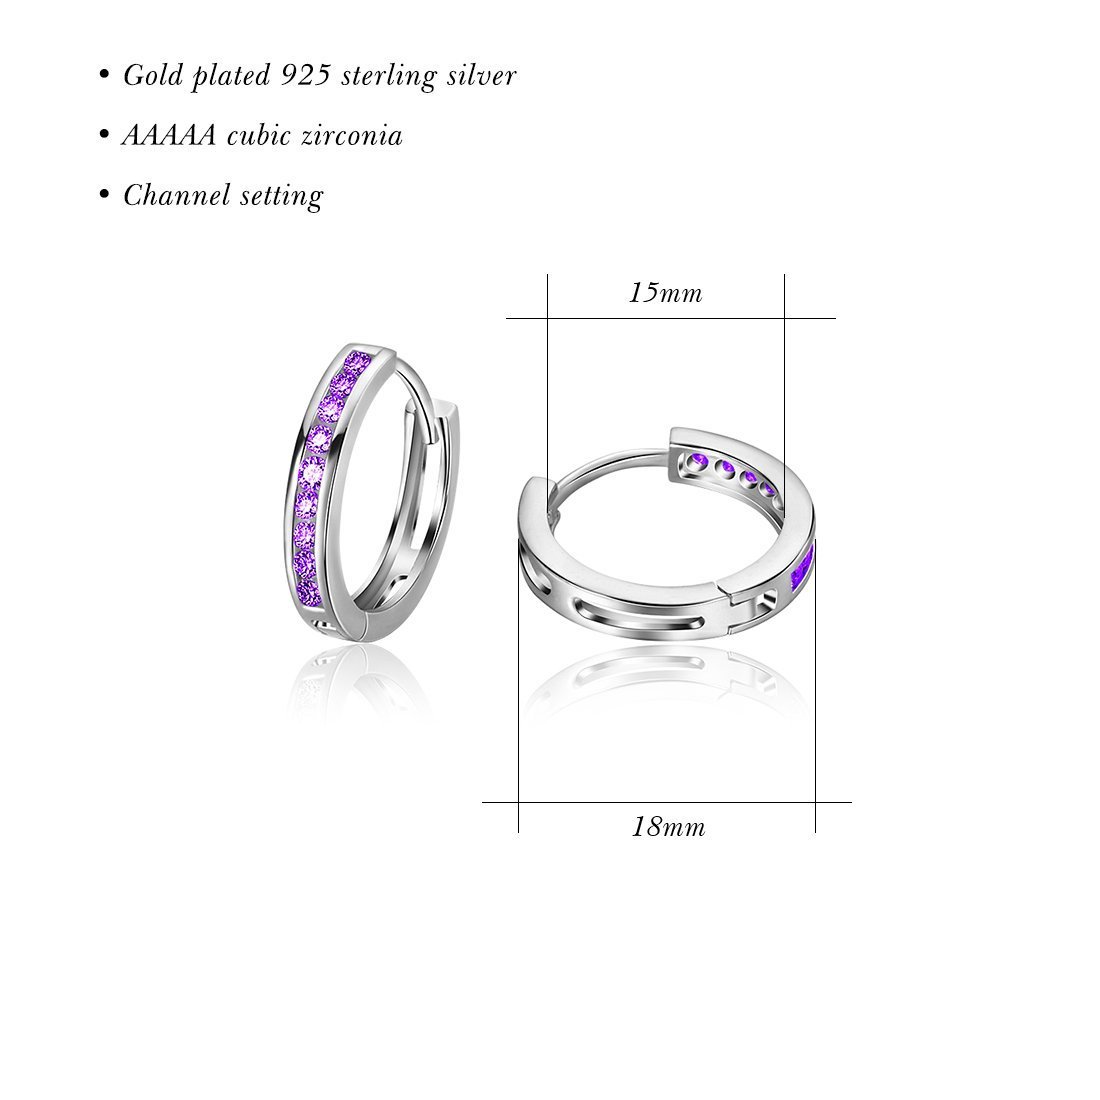 Carleen 925 Sterling Silver Channel Setting Round Cut 9-stone Cubic Zirconia CZ Hinged Hoop Earrings for Women Girls Diameter 1.8cm (Purple) by Carleen (Image #4)